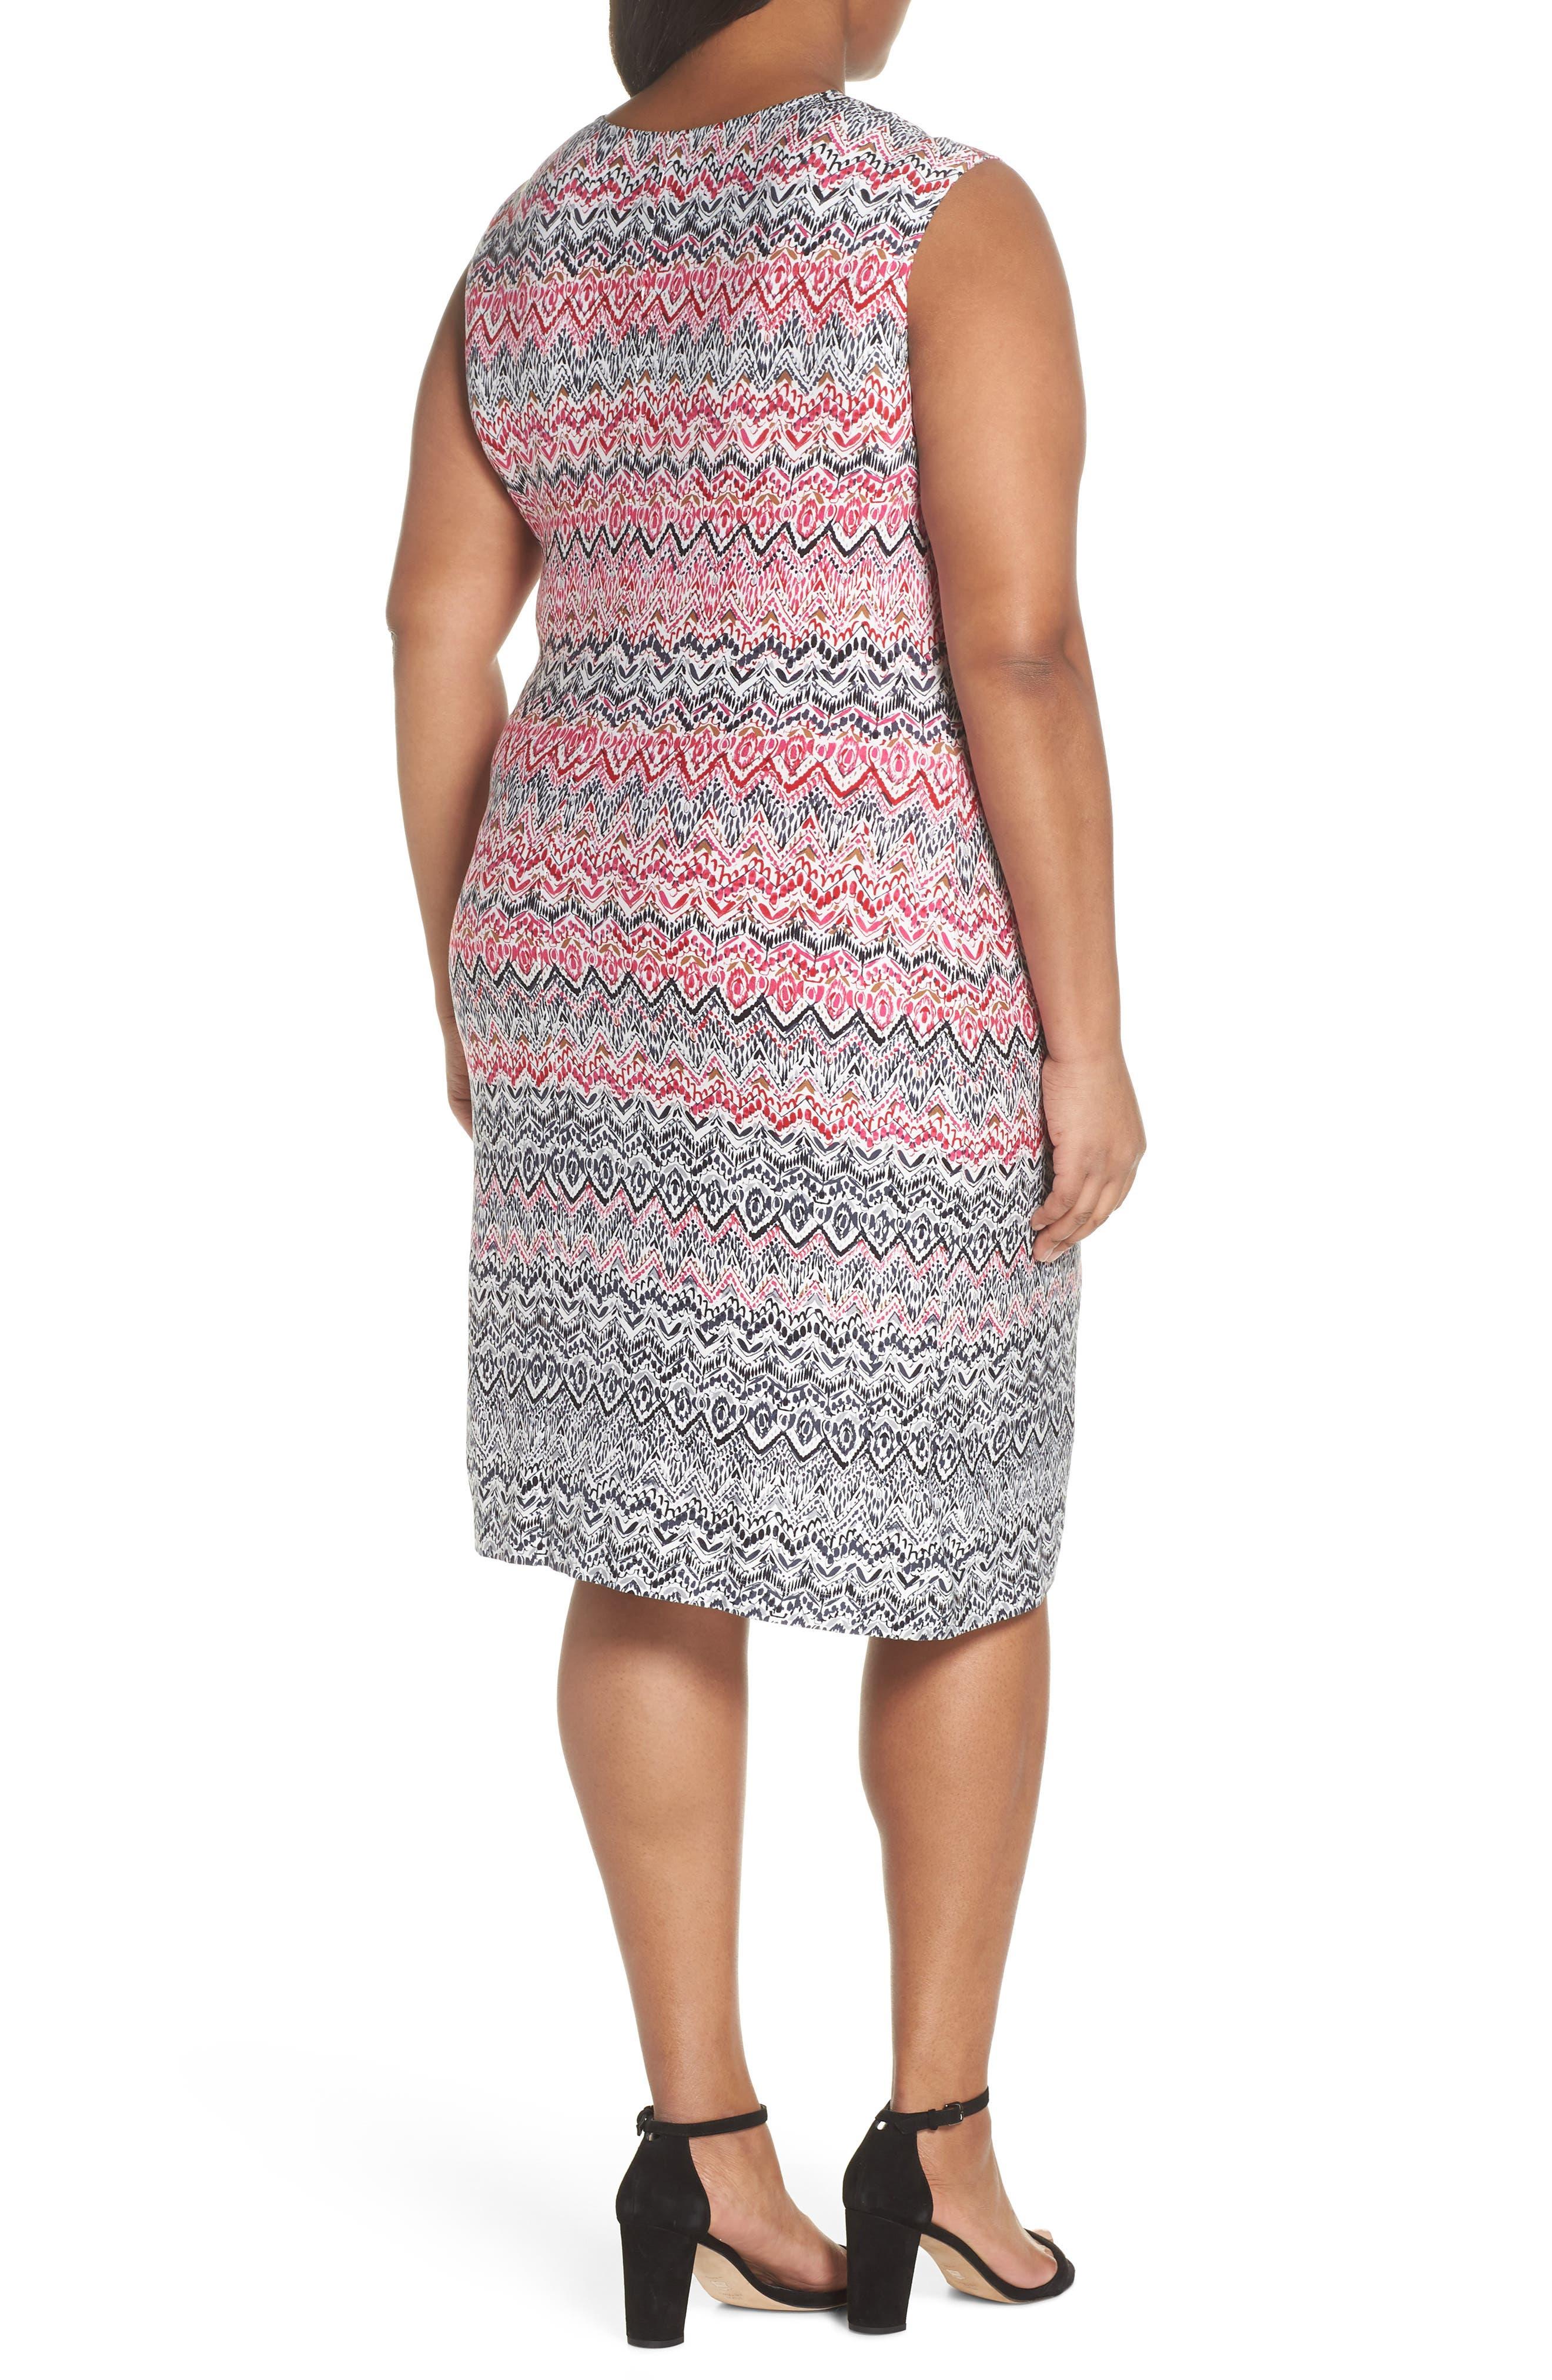 Alternate Image 2  - NIC+ZOE Spiced Up Twist Sheath Dress (Plus Size)